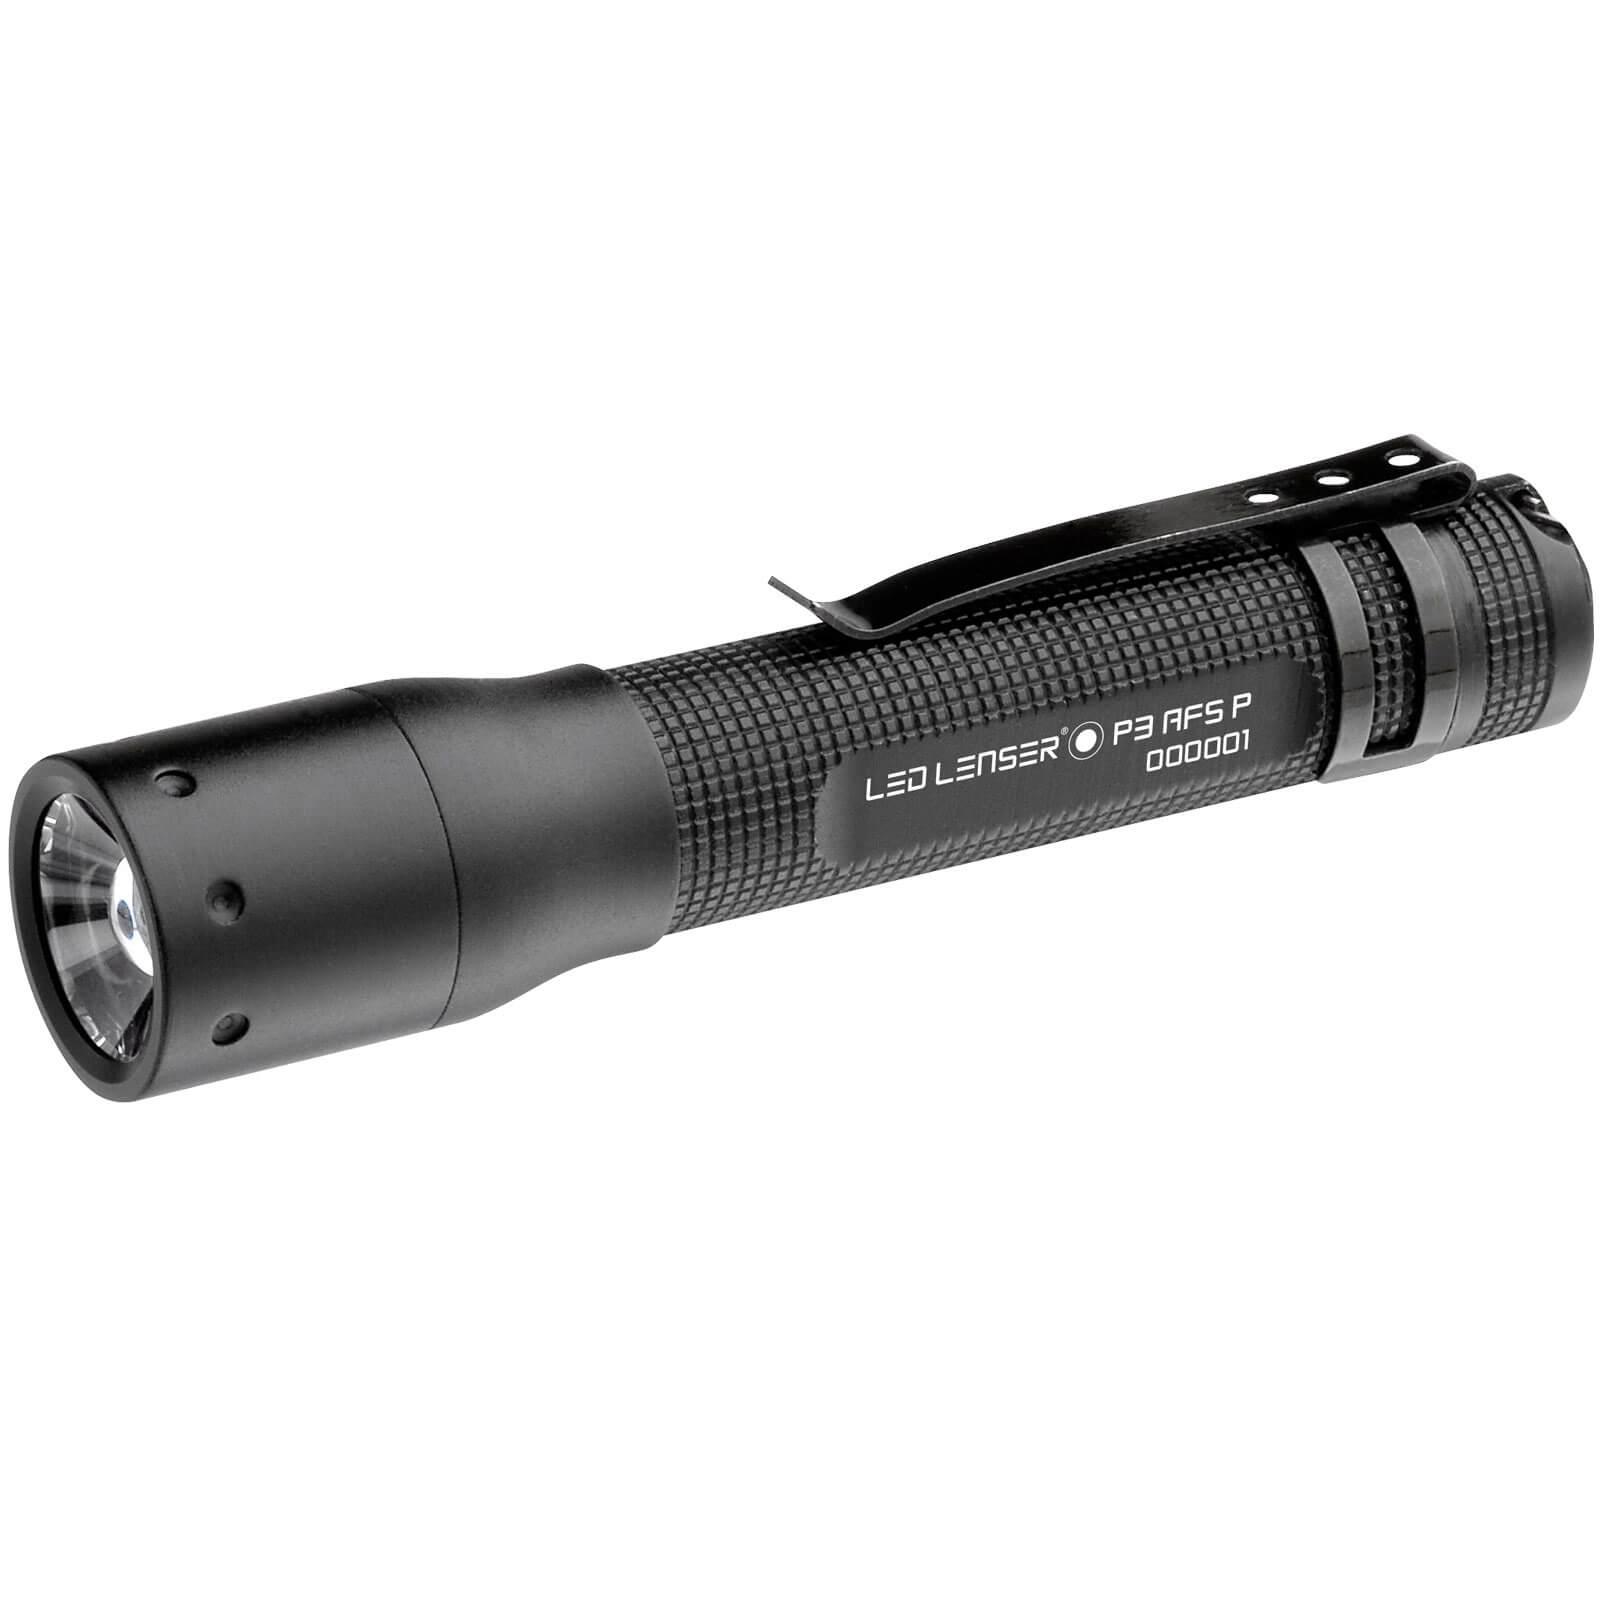 LED Lenser P3 Advanced Focus System Torch Black in Gift Box 25 Lumens